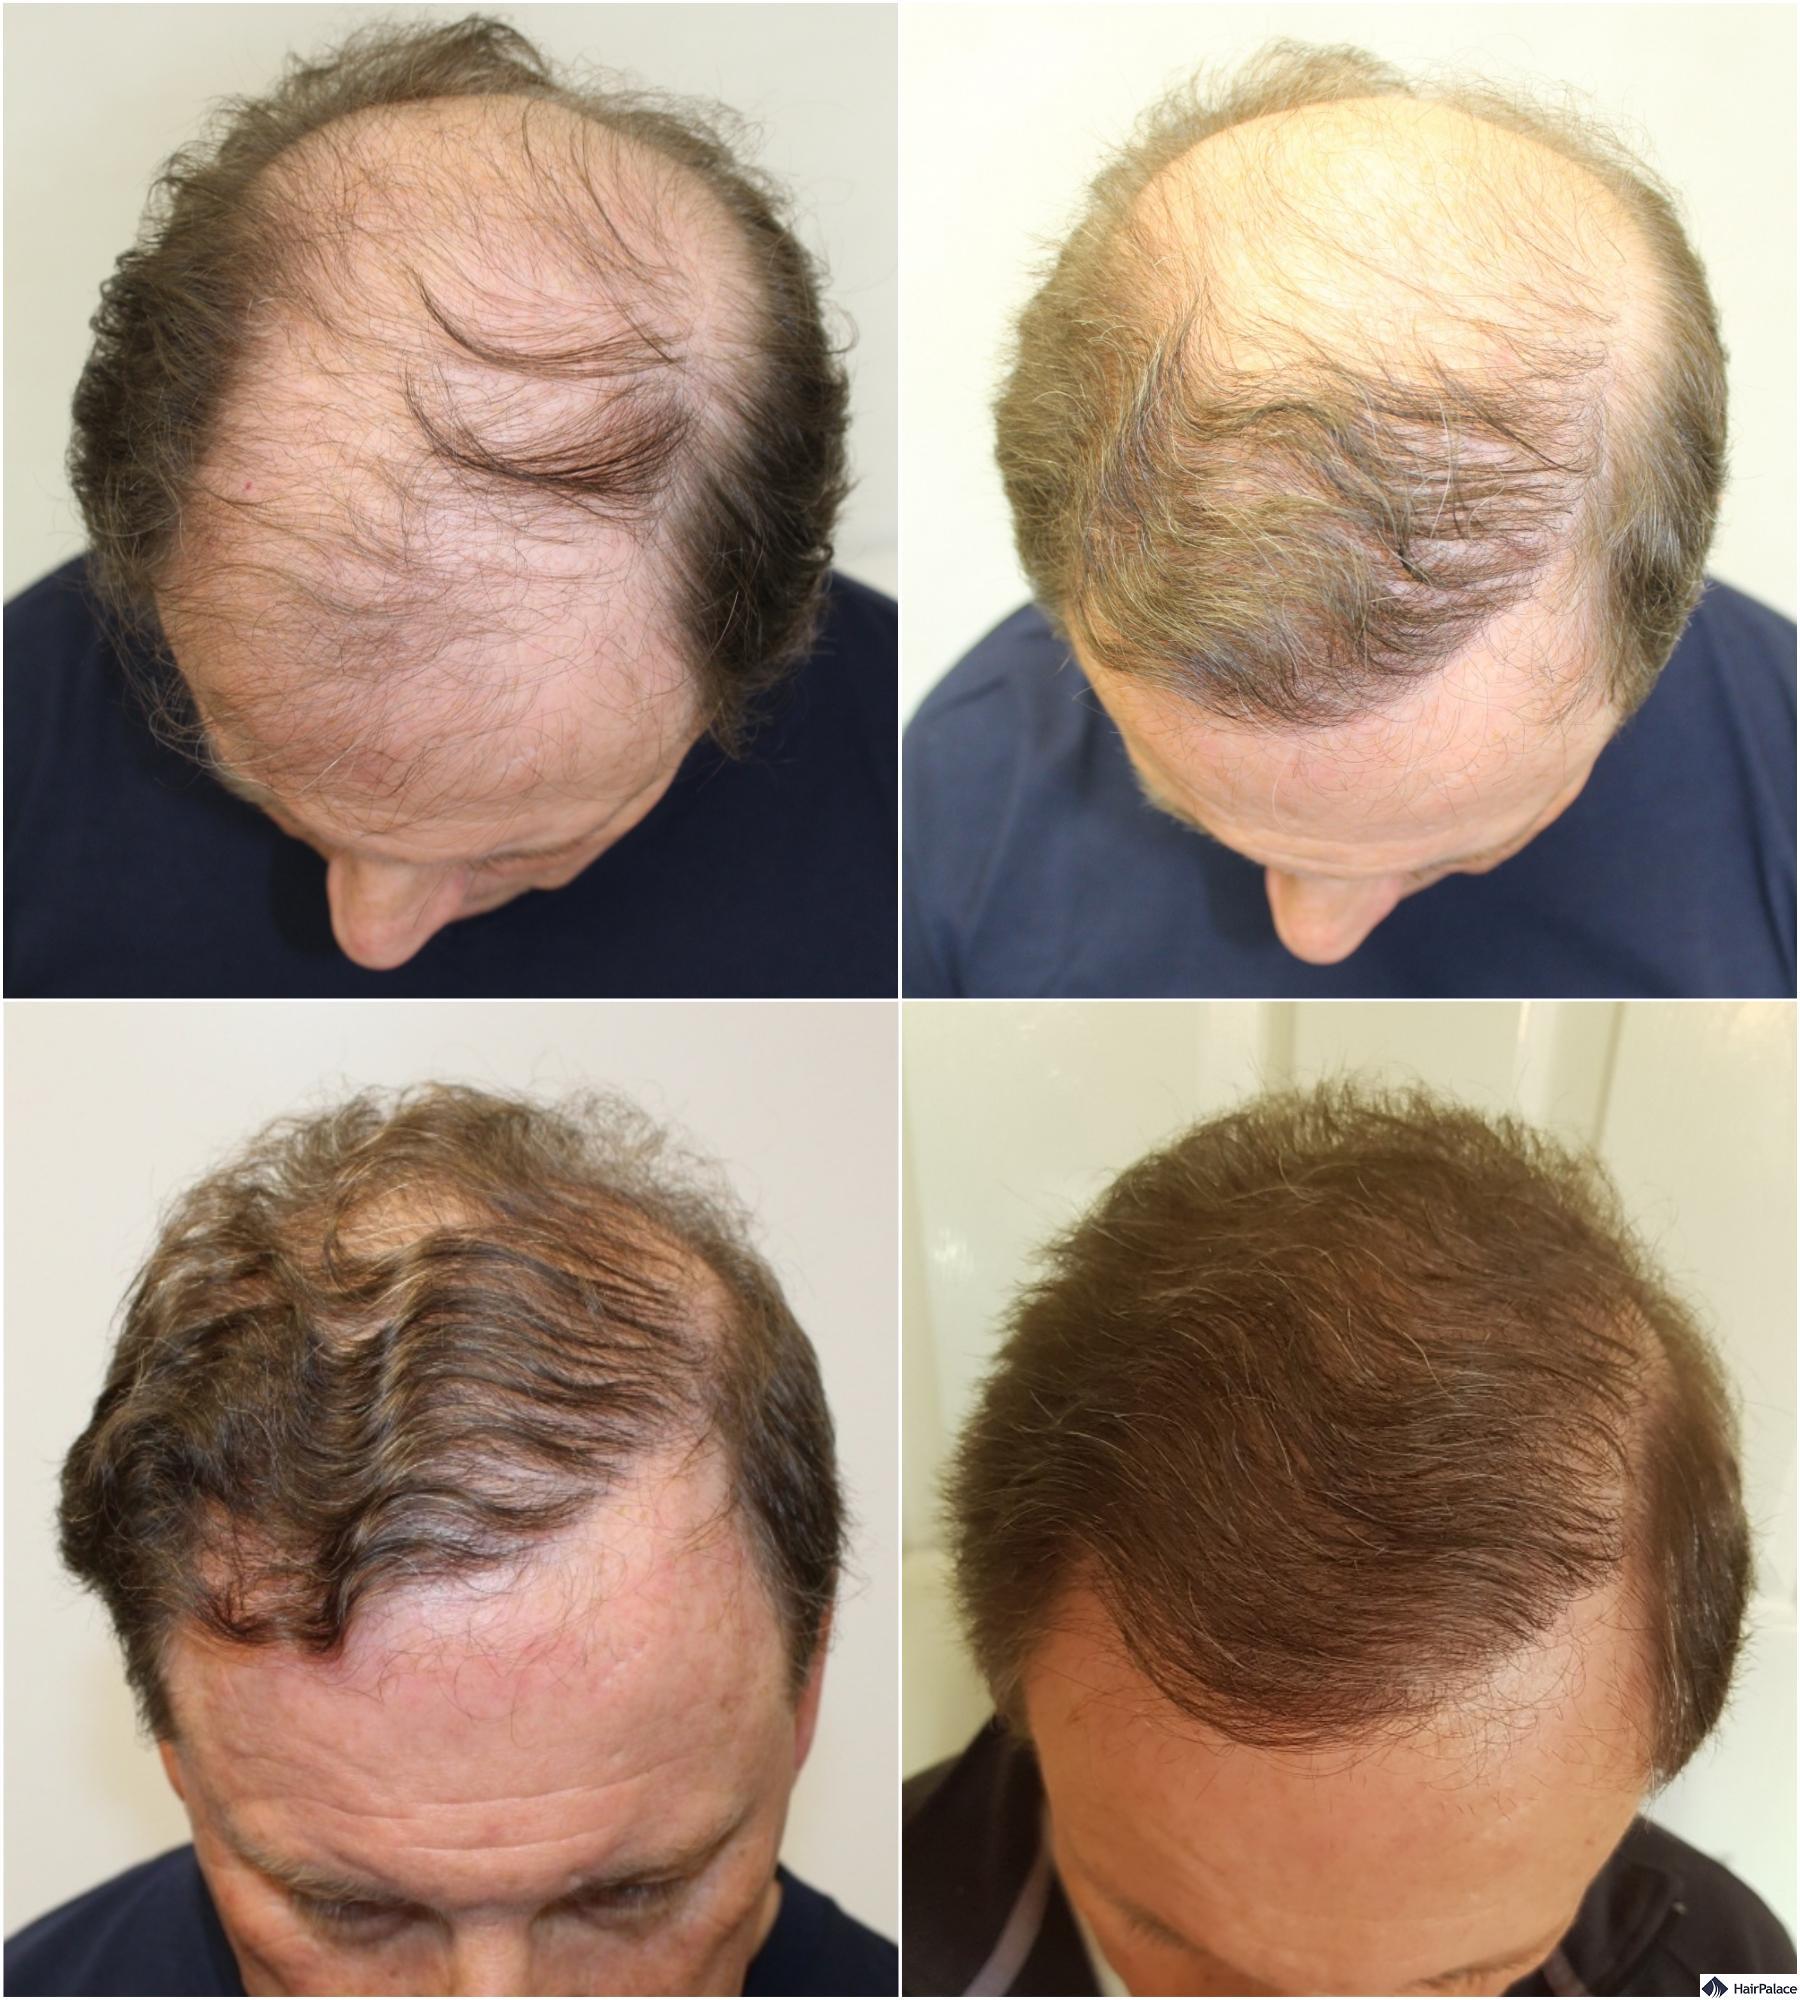 FUE hair restoration step by step